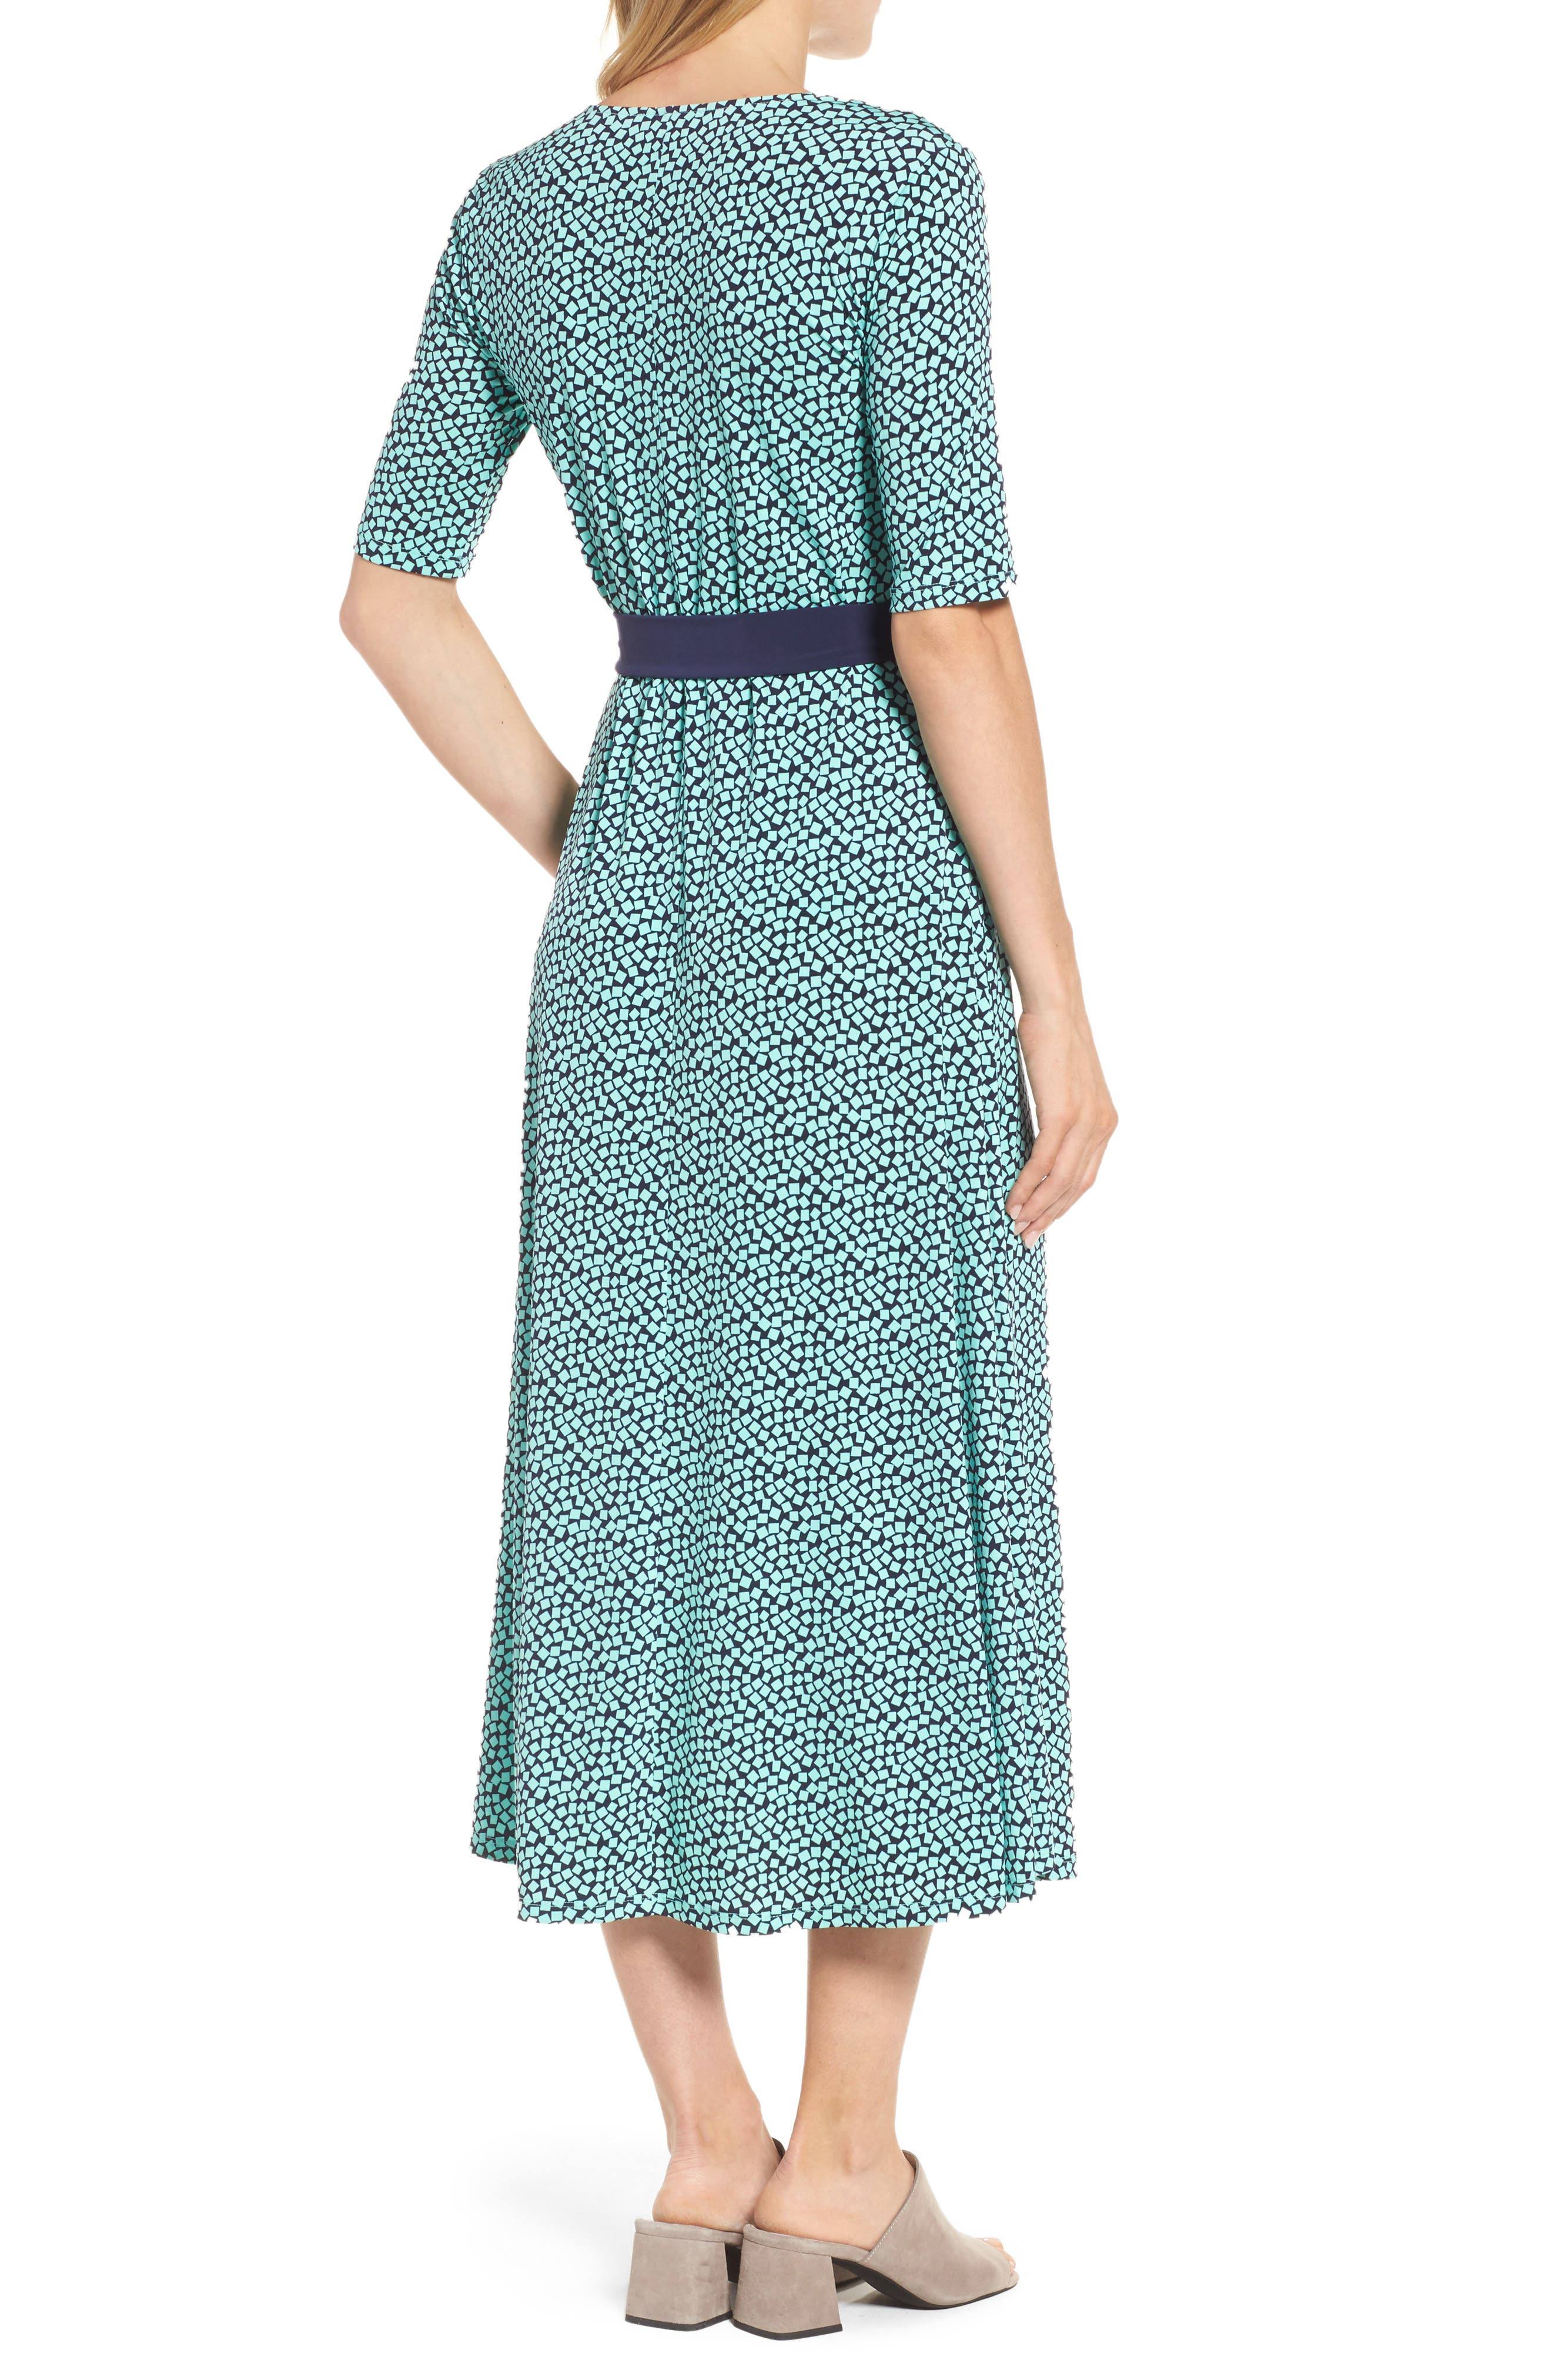 Belted Cube Print Midi Dress,                             Alternate thumbnail 2, color,                             336